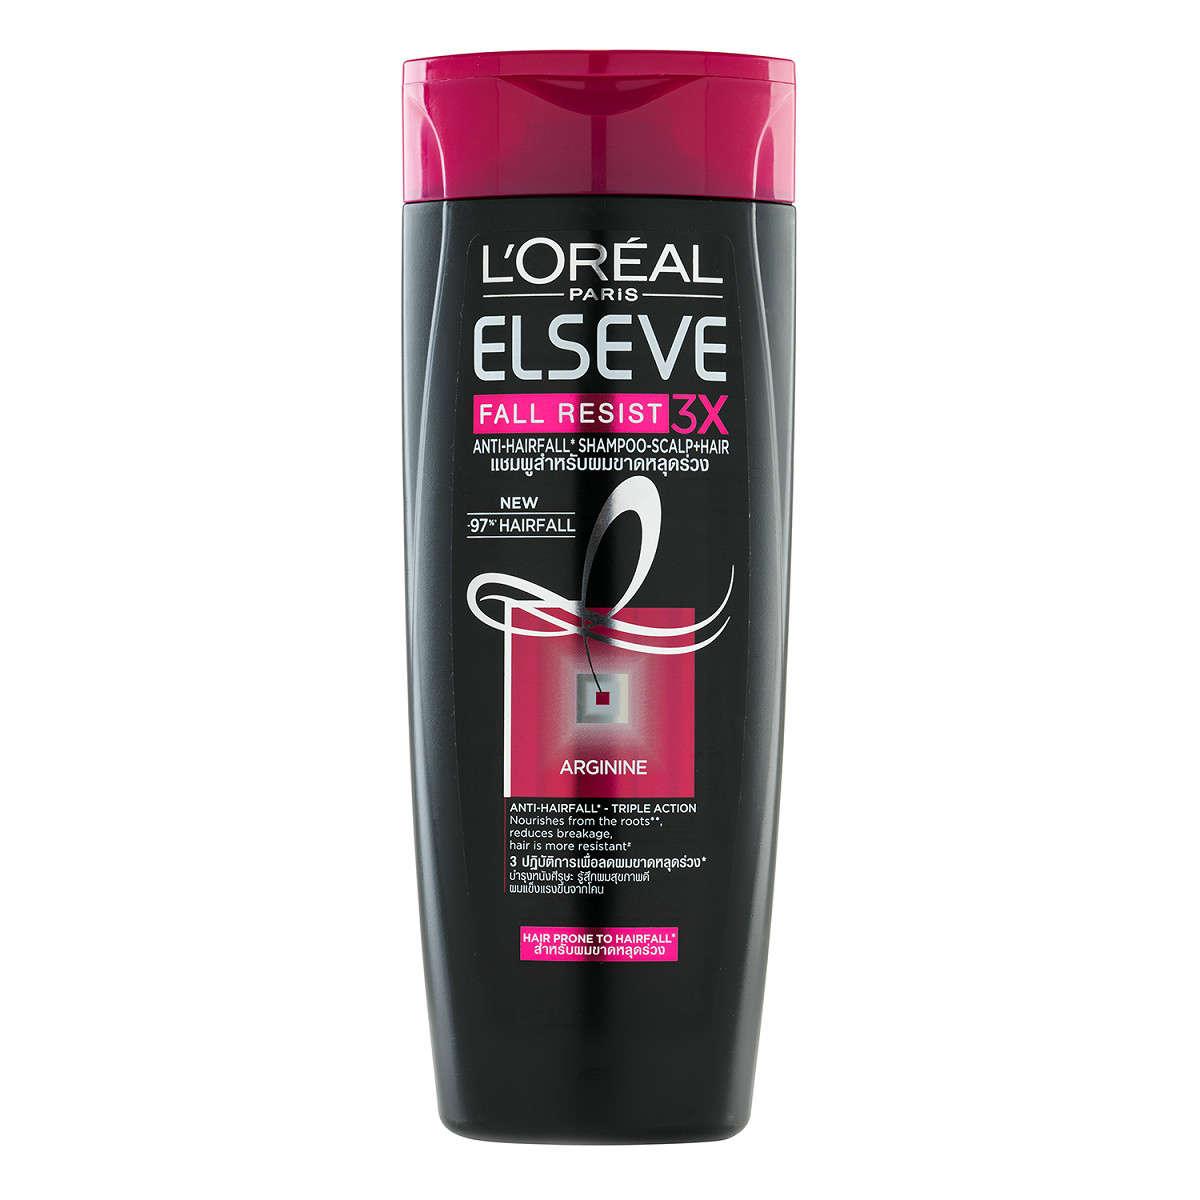 Dưỡng tóc-L'Oreal Paris Elseve Fall Resist 3X Shampoo.